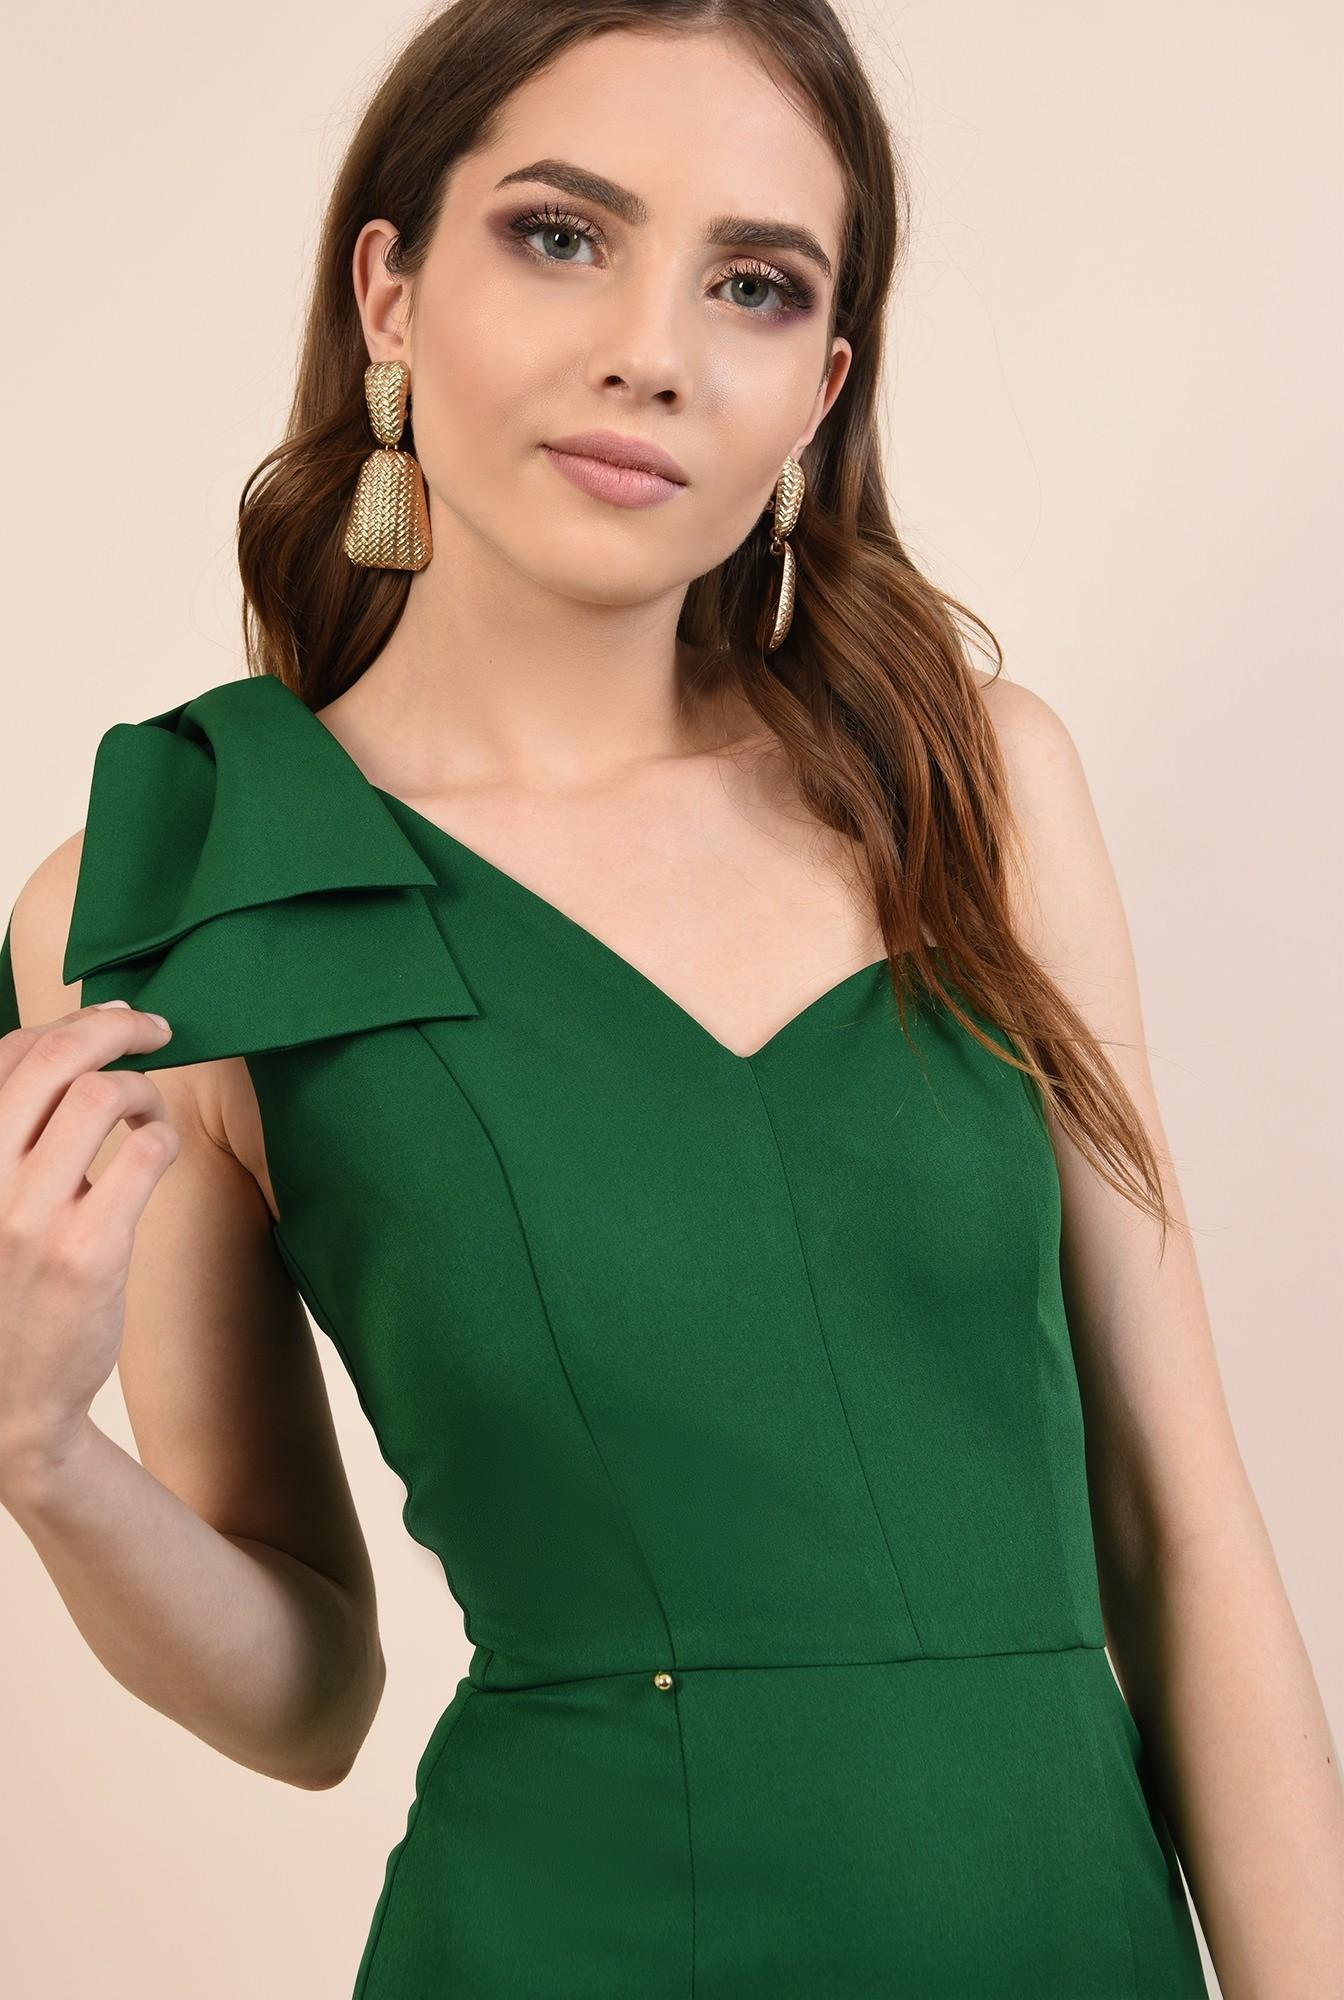 2 - rochie de ocazie, verde, clepsidra, funde la umar, rochii elegante online